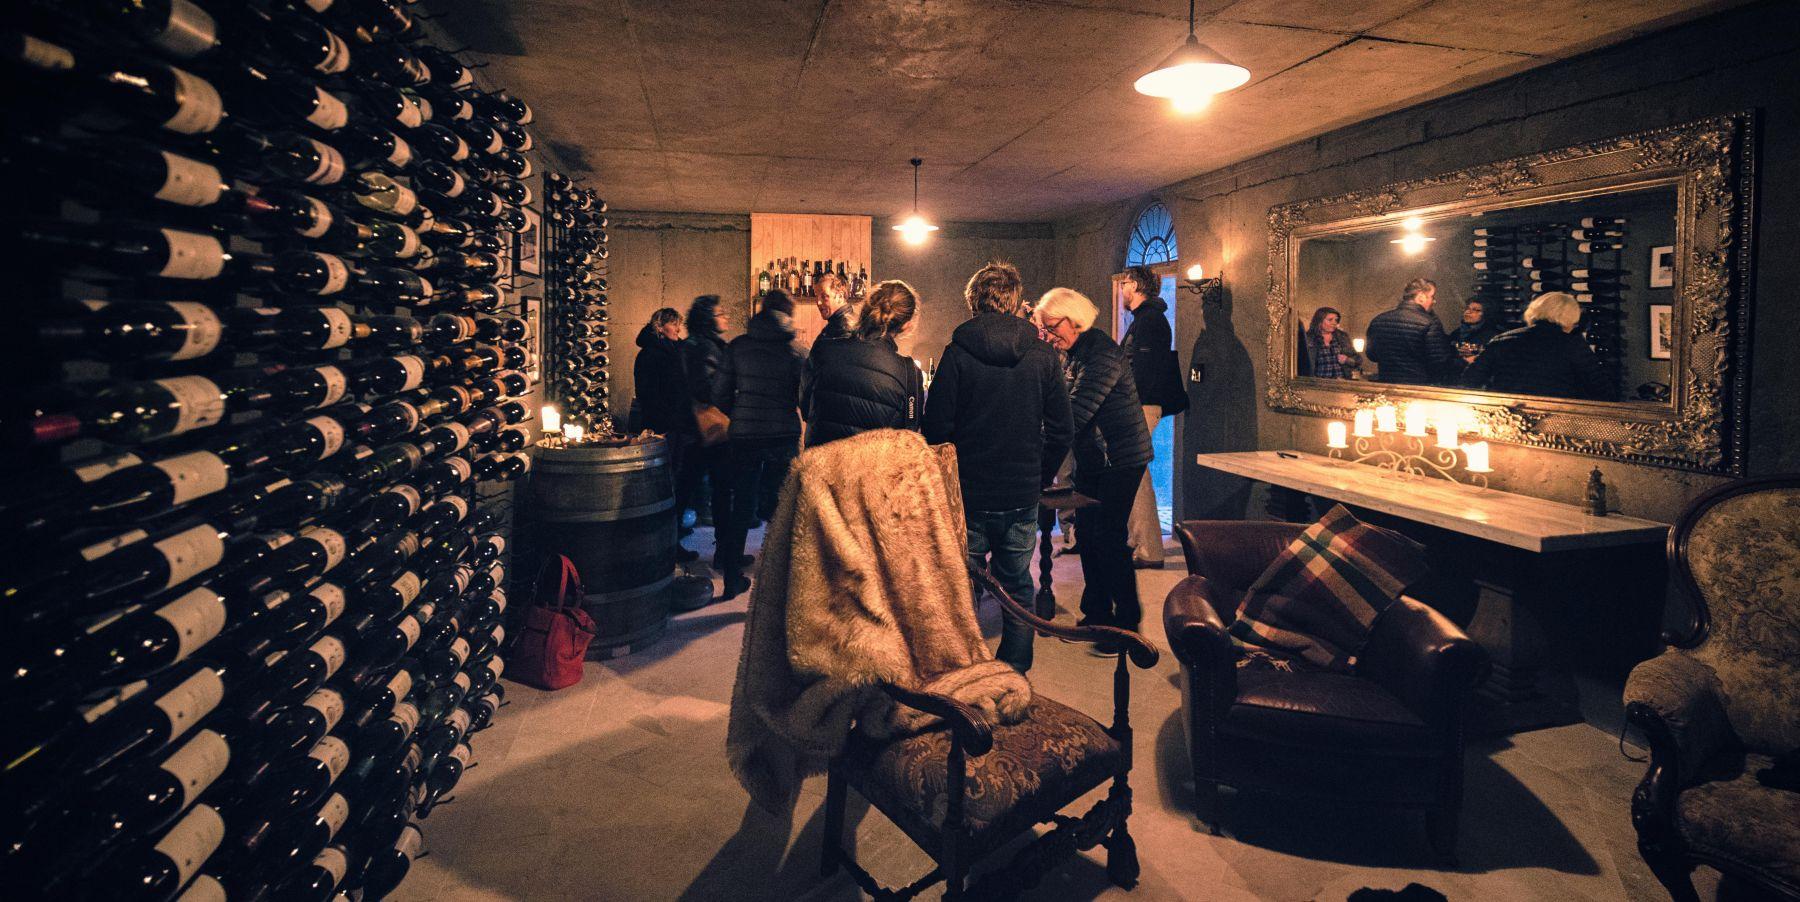 pukaki wine cellar and observatory group gathering